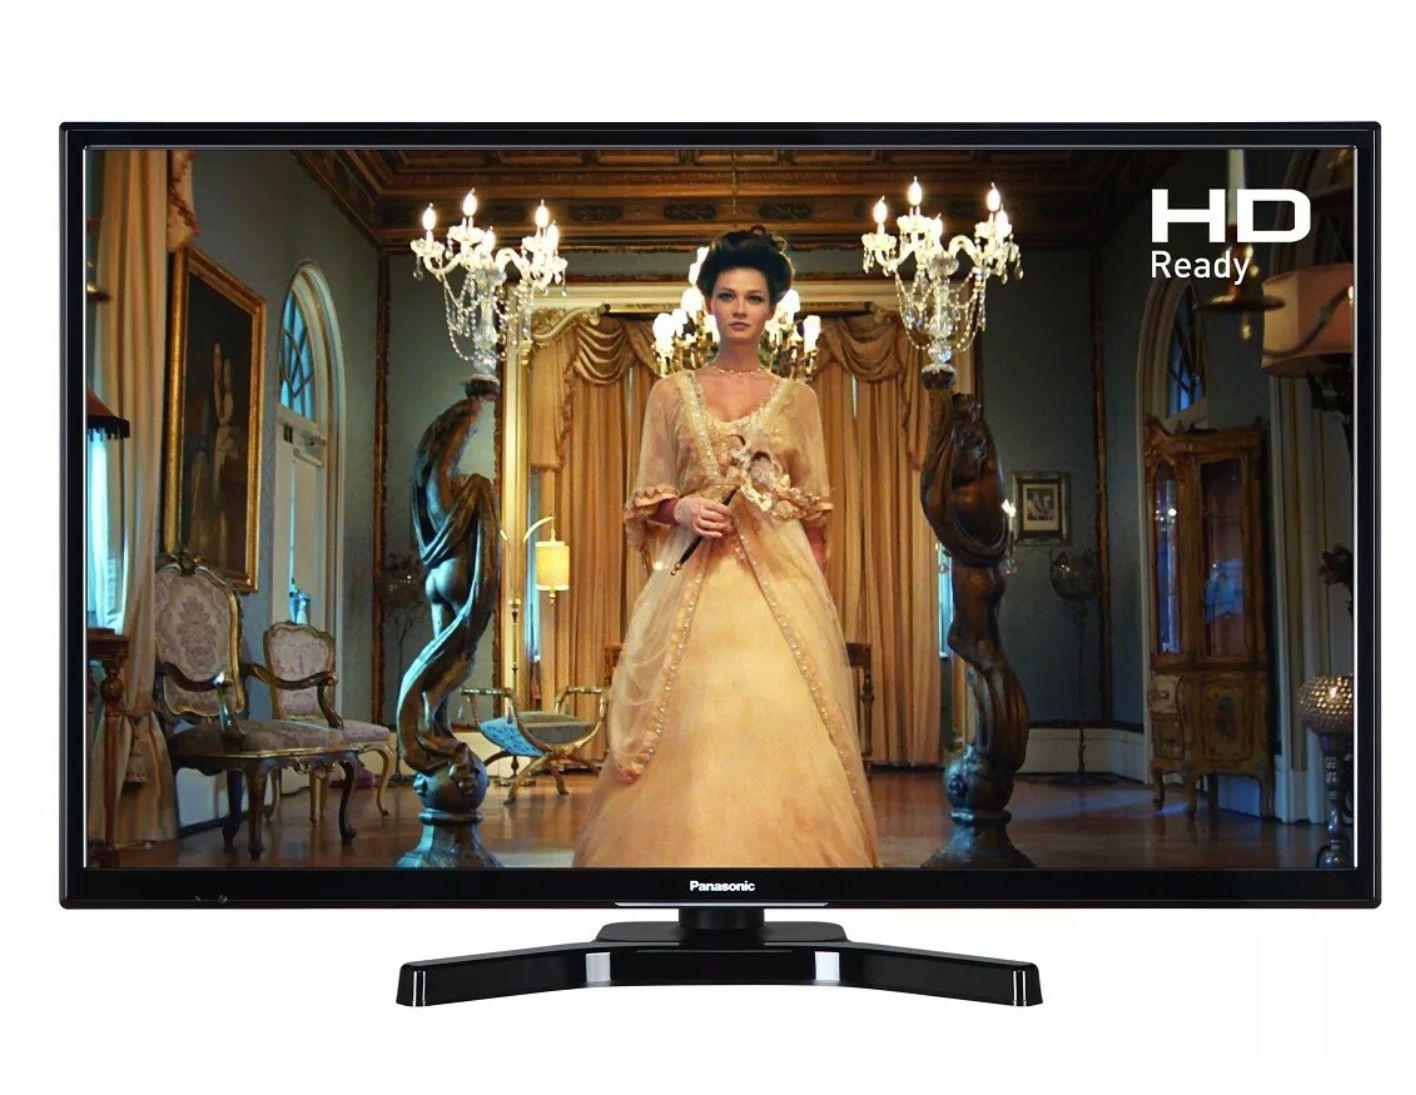 Refurbished Panasonic TX-24E302B 24 Inch HD Ready LED TV Freeview HD USB Playback Black £69.99 @ Panasonic on eBay